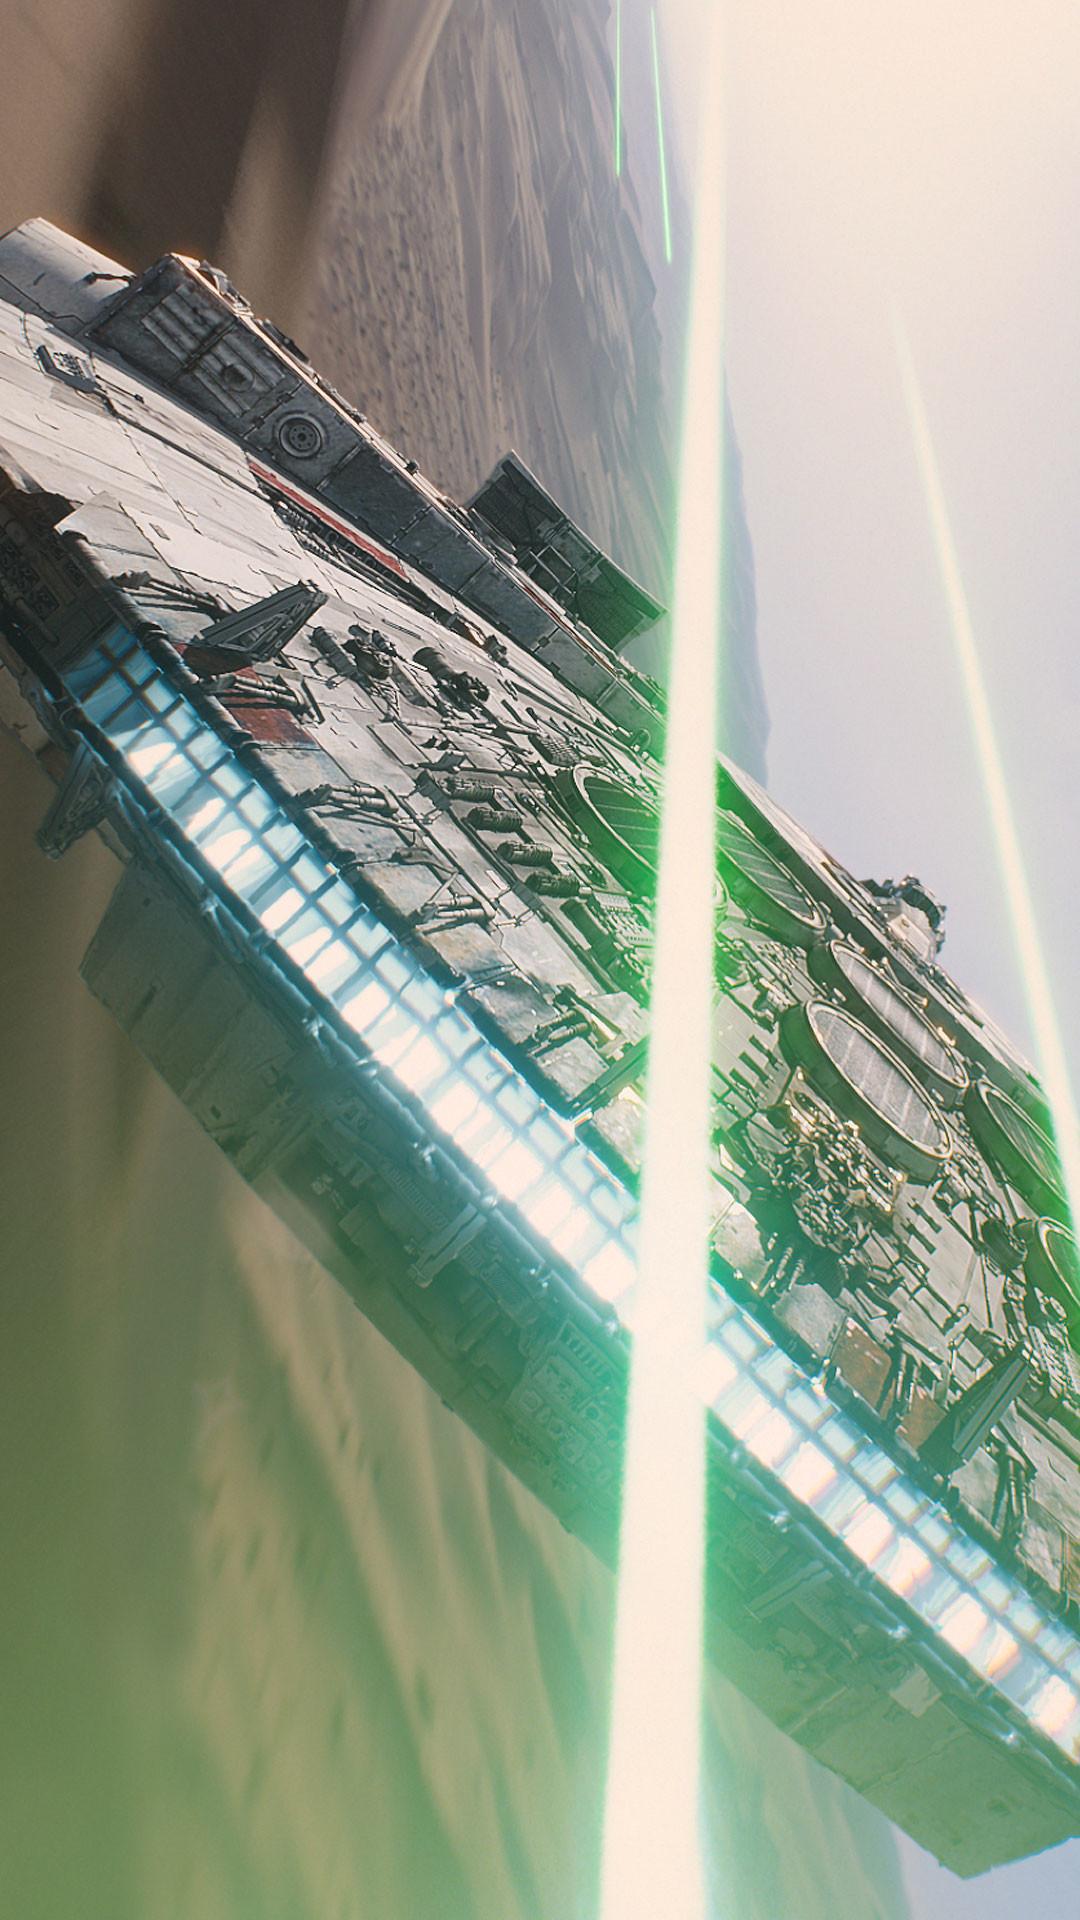 … star wars the force awakens hd images released by disney slashgear; millenium  falcon 798363 walldevil …